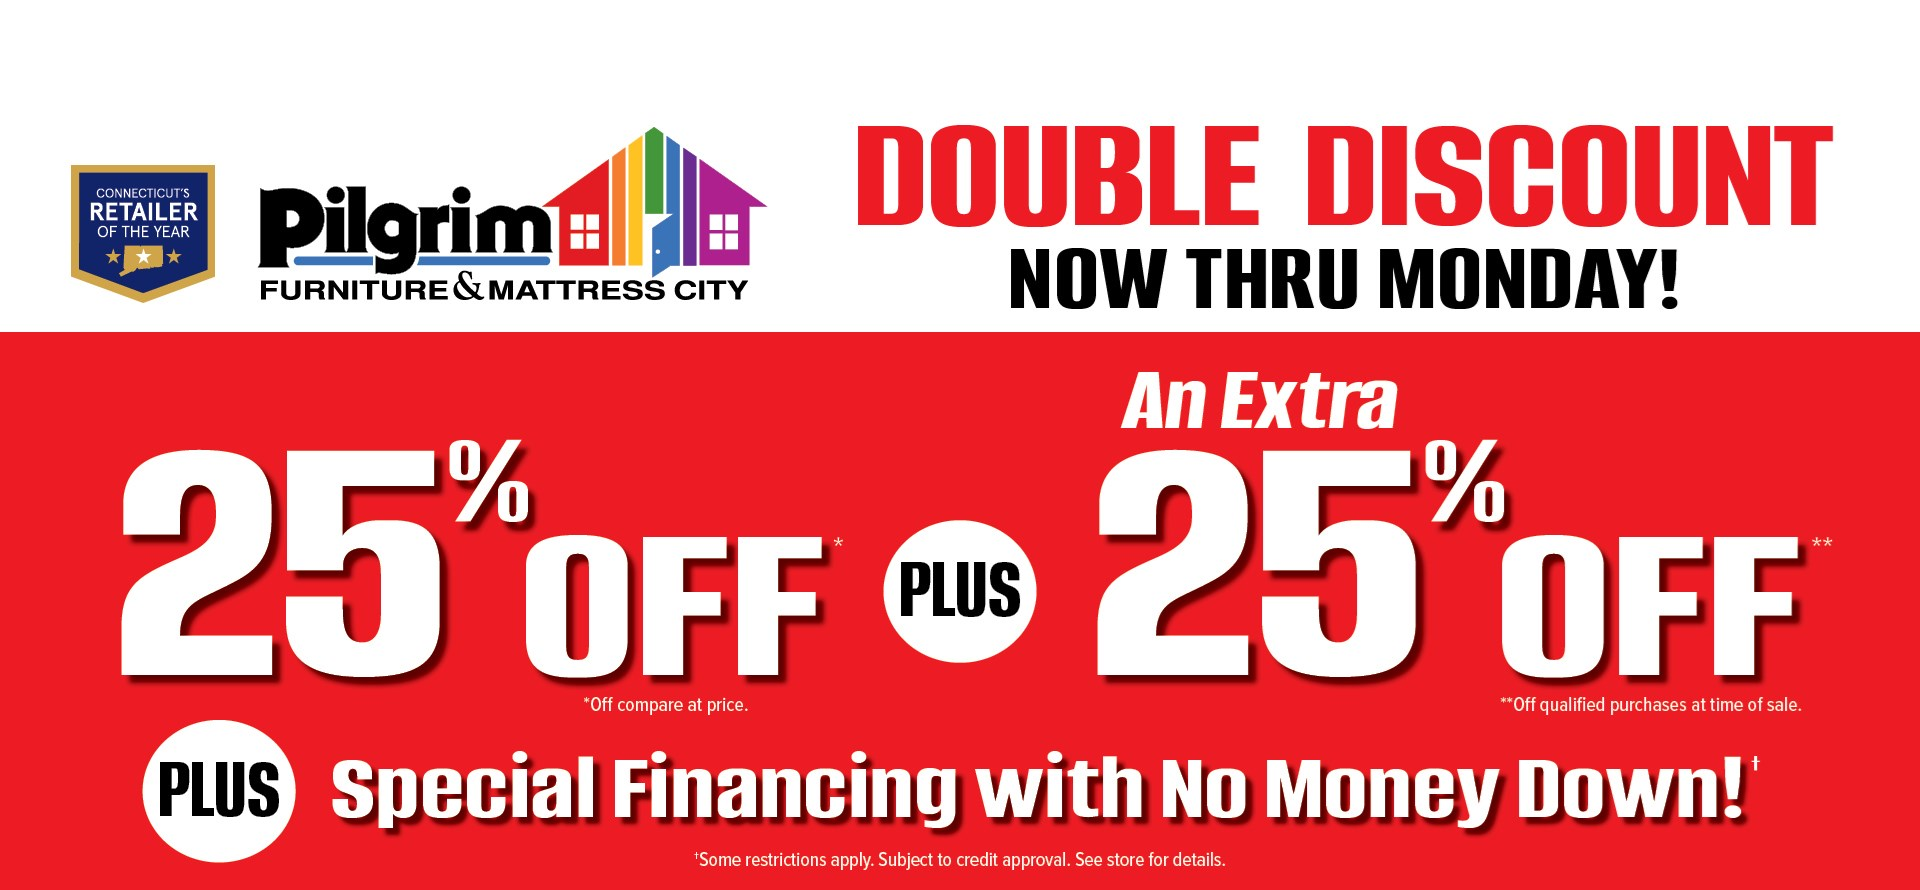 Double Discount